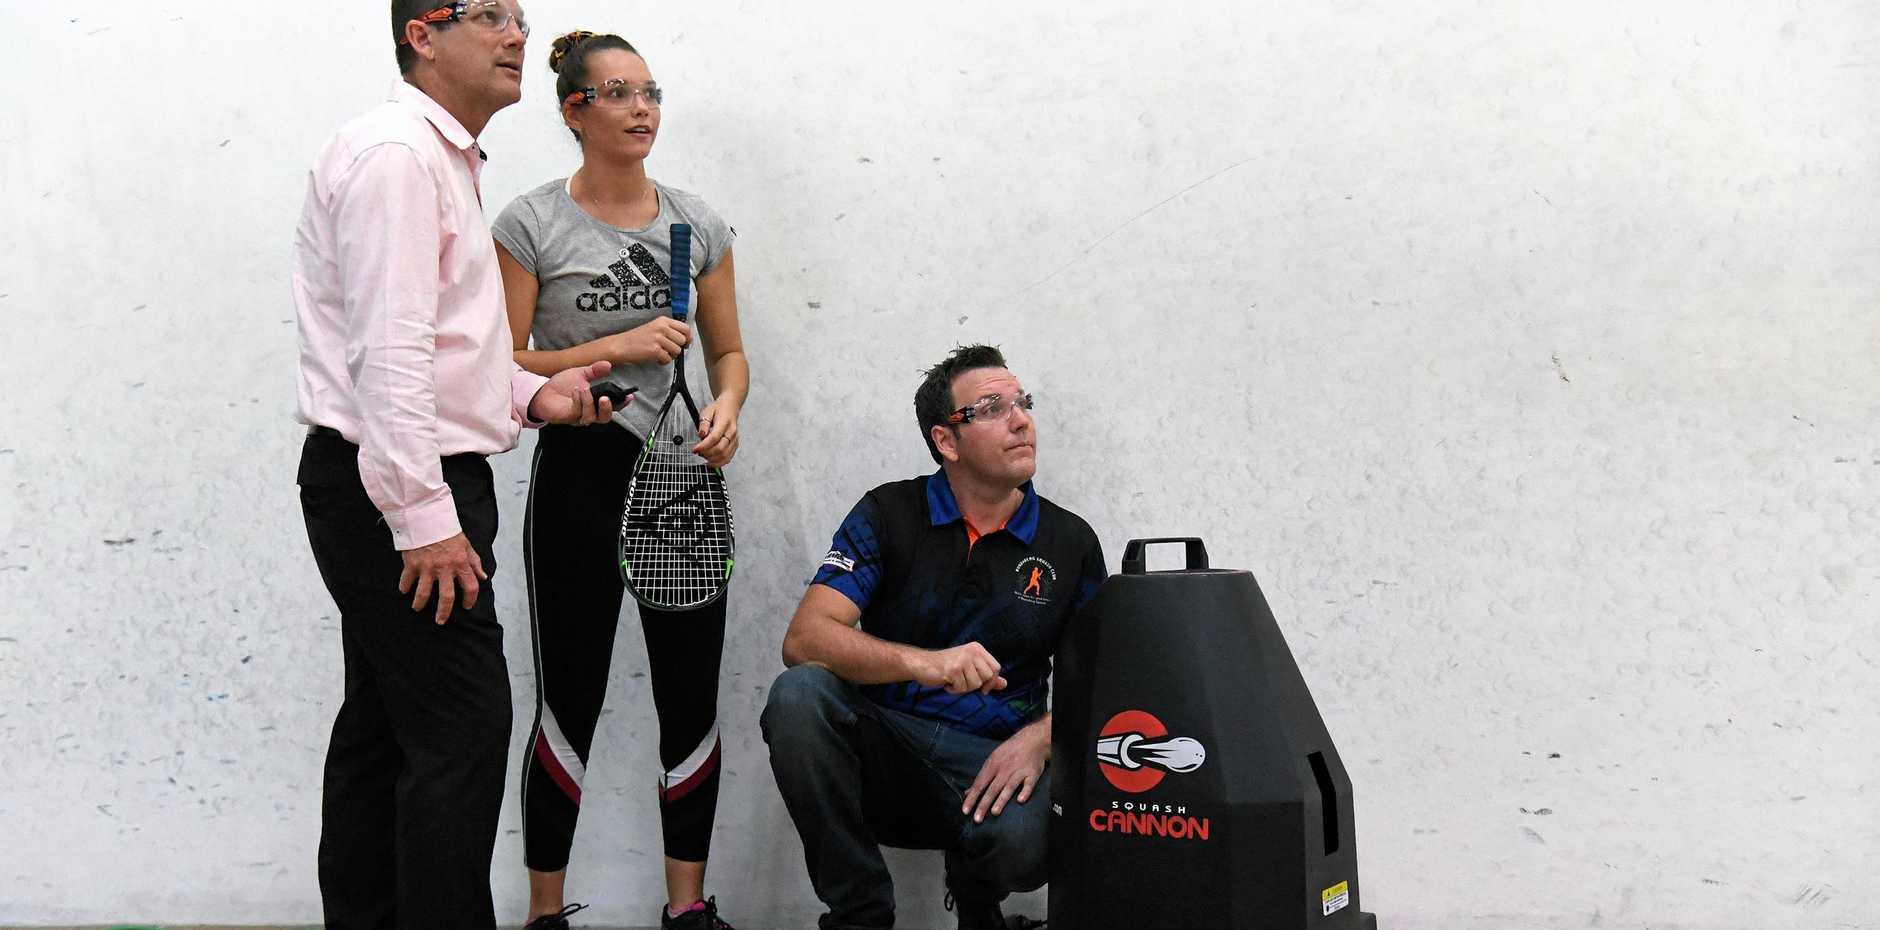 BIT HIT: Bundaberg MP  David Batt, Tasmin Swan  and Brendan Egan check  out the squash cannon.